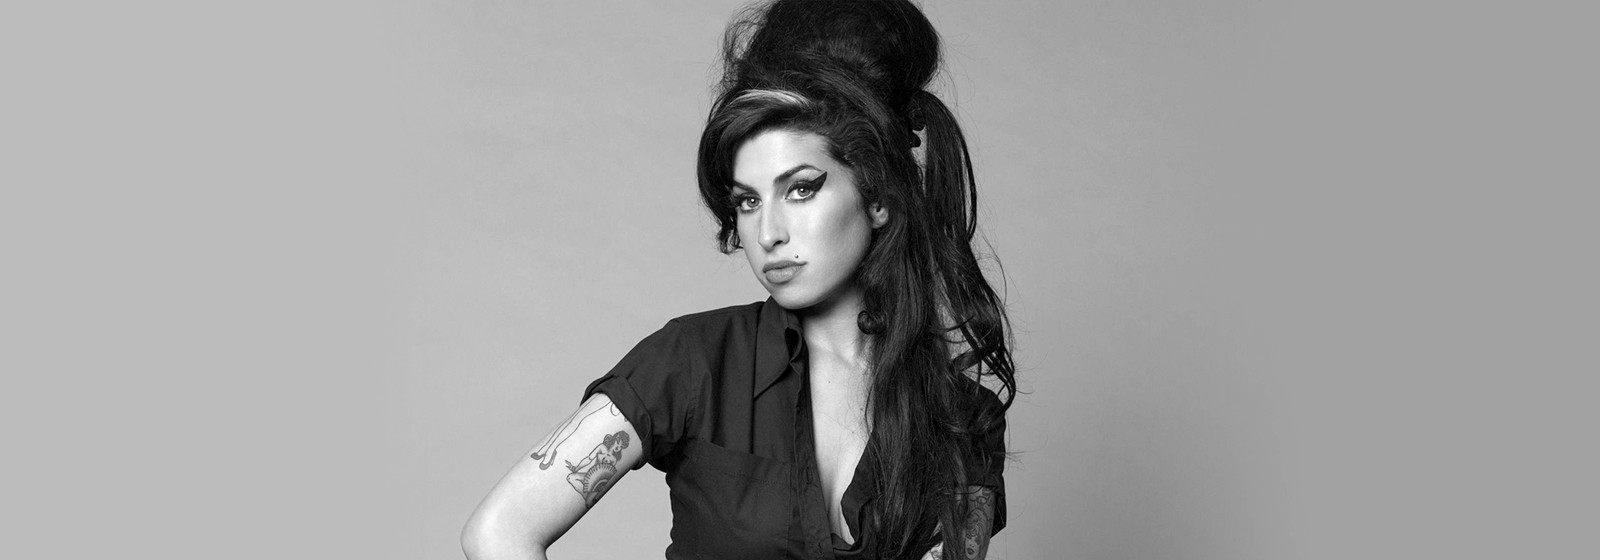 5 anos sem Amy